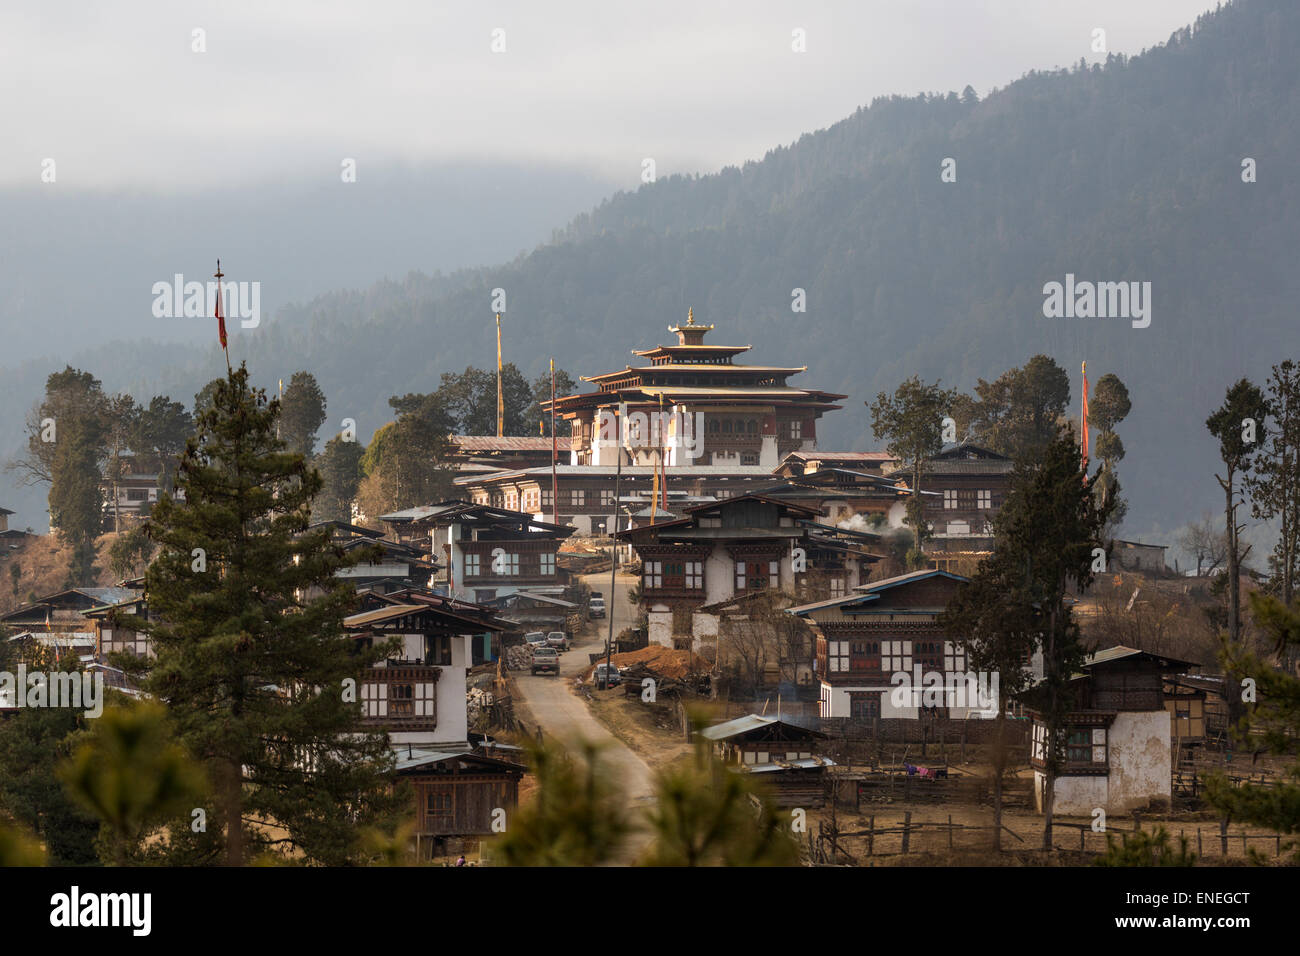 Gangtey Monastery and village, Phobjiokha Valley, Western Bhutan, Asia - Stock Image